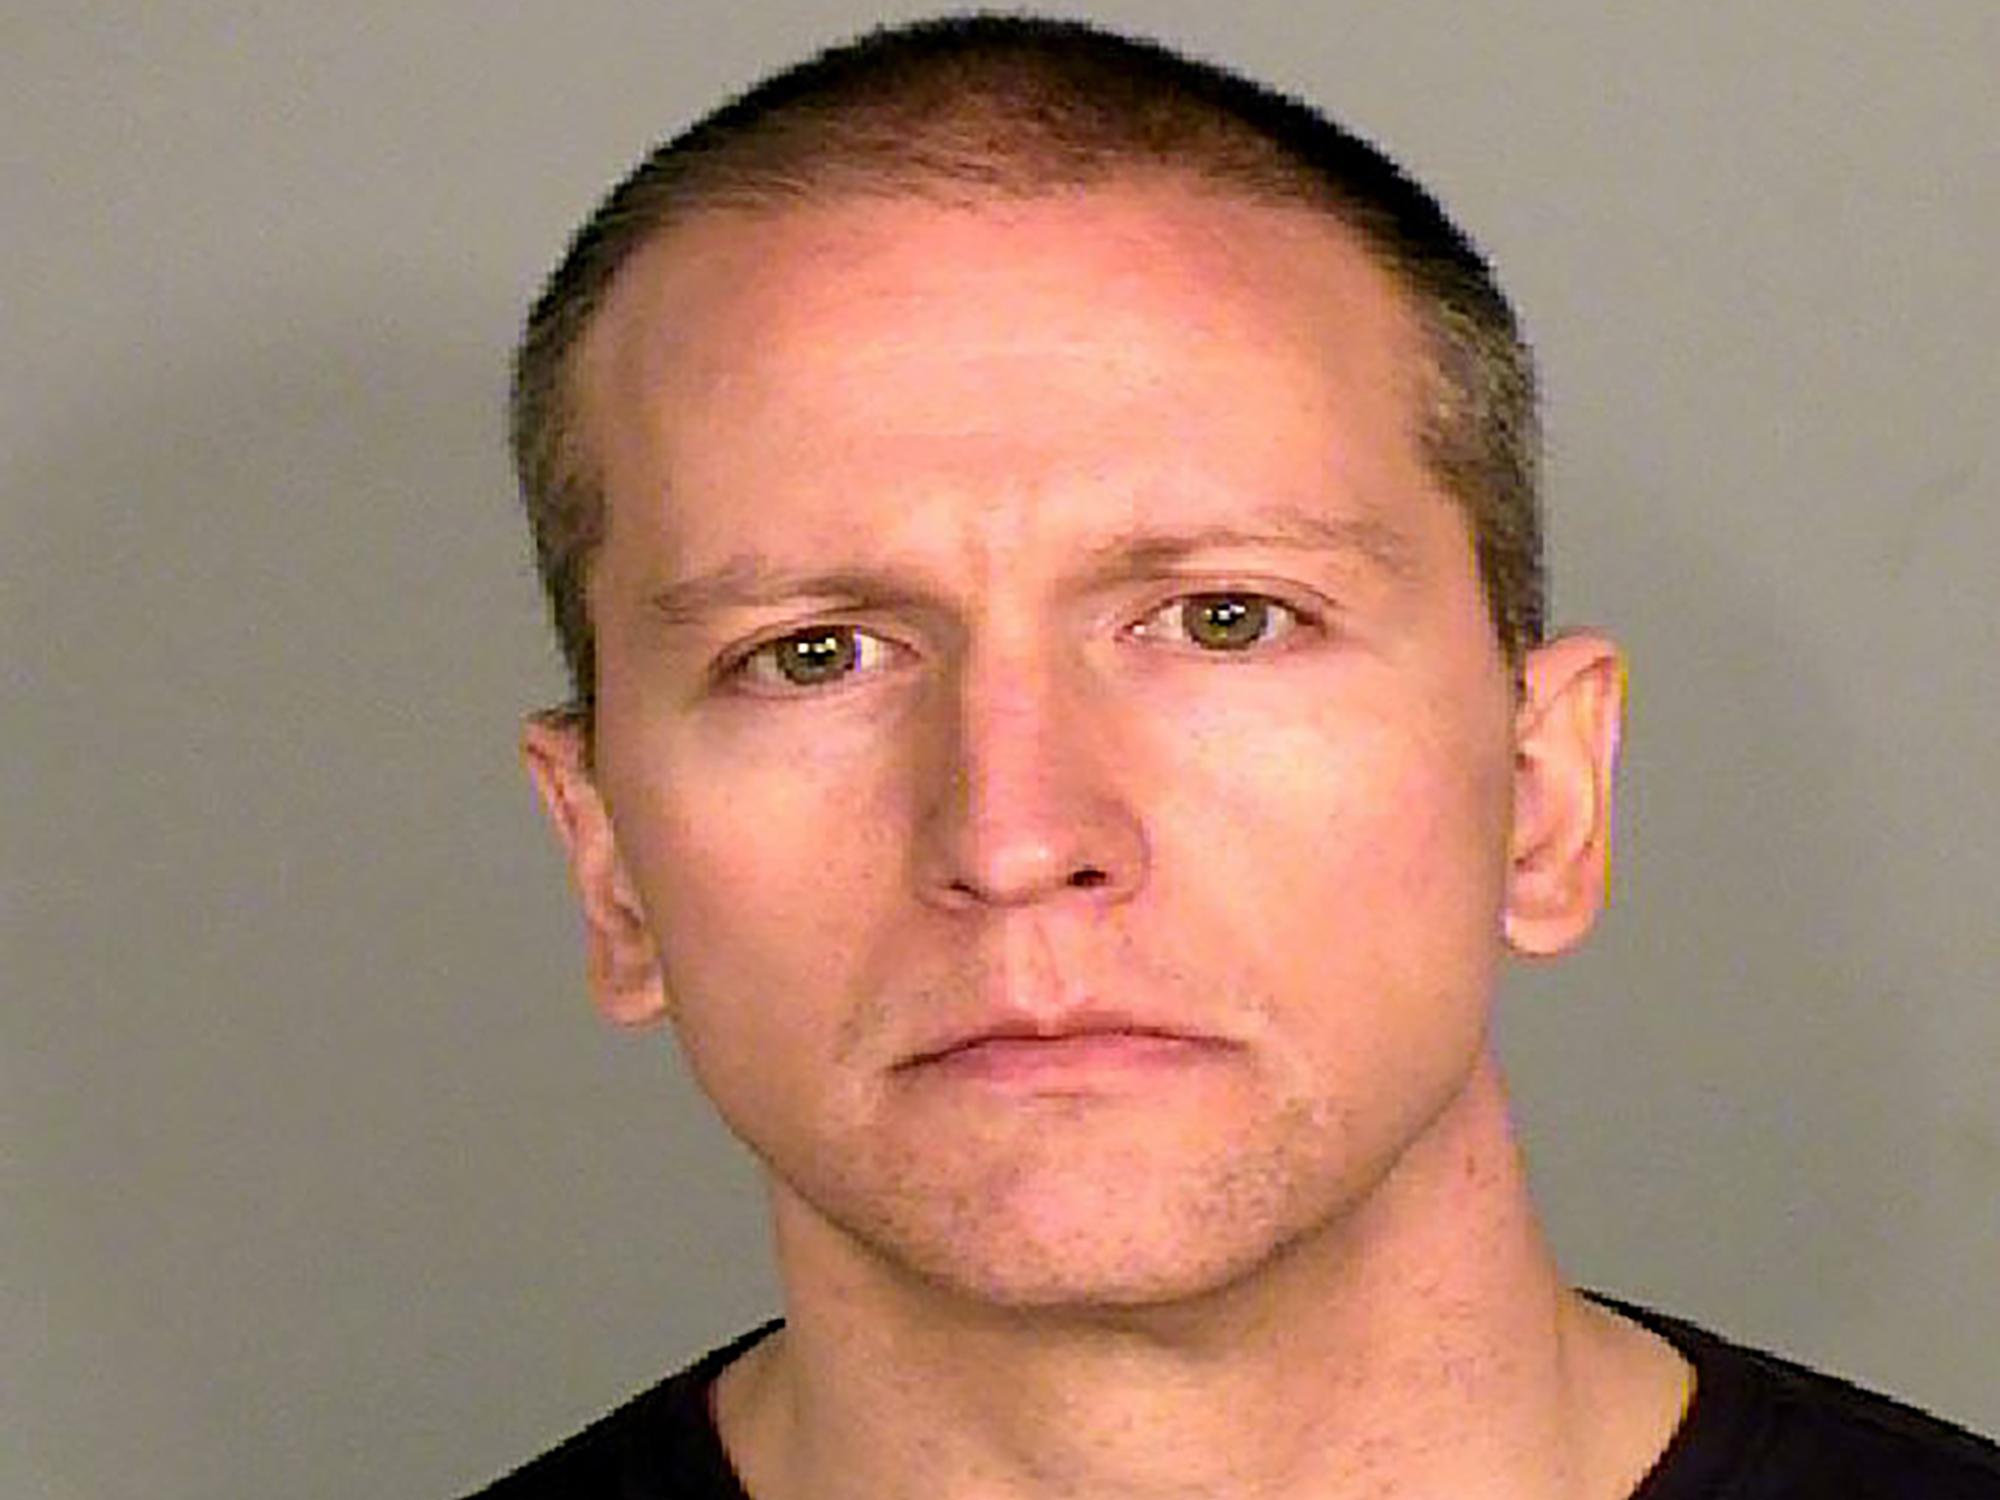 Judge dismisses 1 charge against former cop in Floyd's death